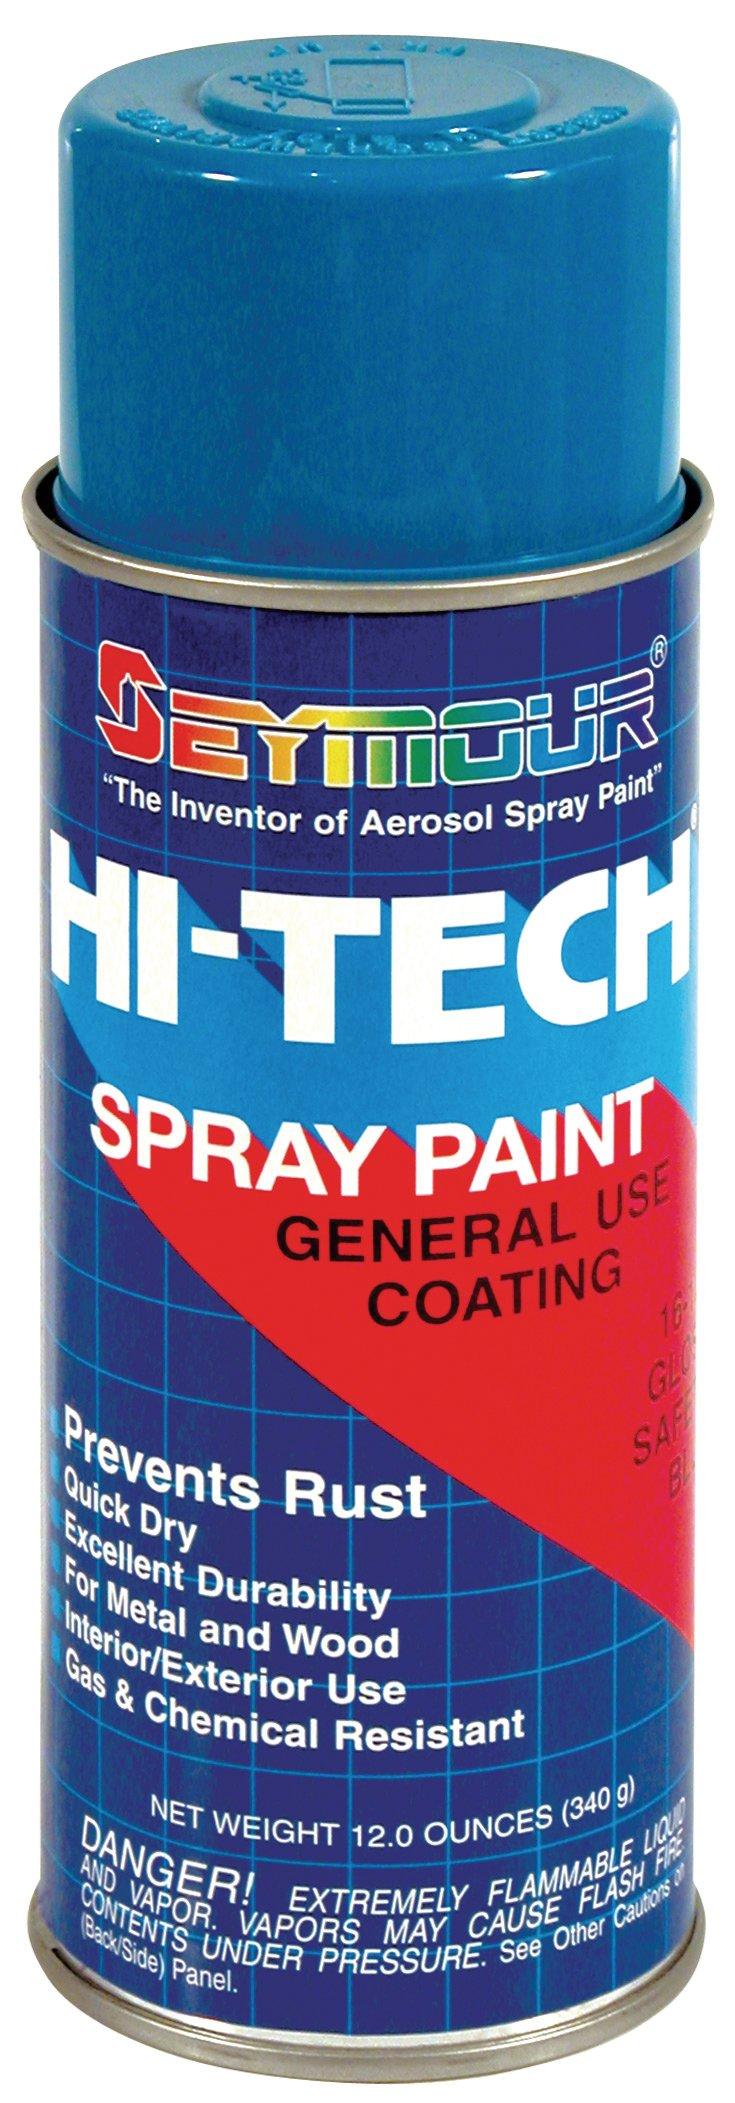 Seymour 16-129 Hi-Tech Enamels Spray Paint, Gloss Safety Blue